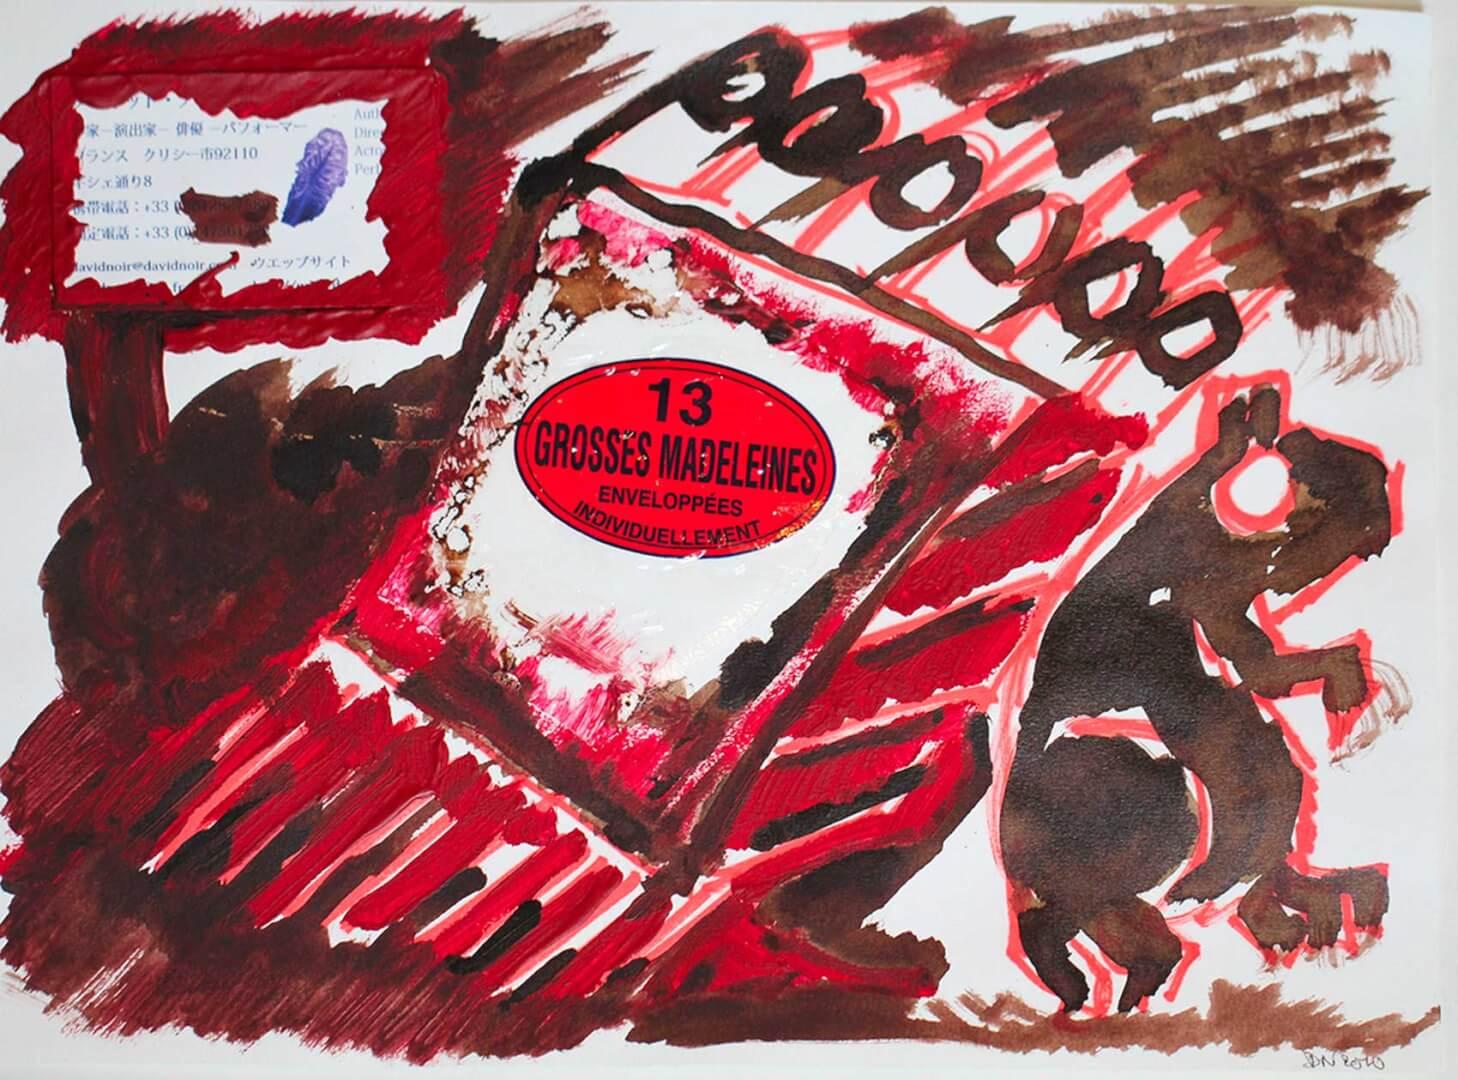 Grosses madeleines © David Noir | Dessins, peintures, collages